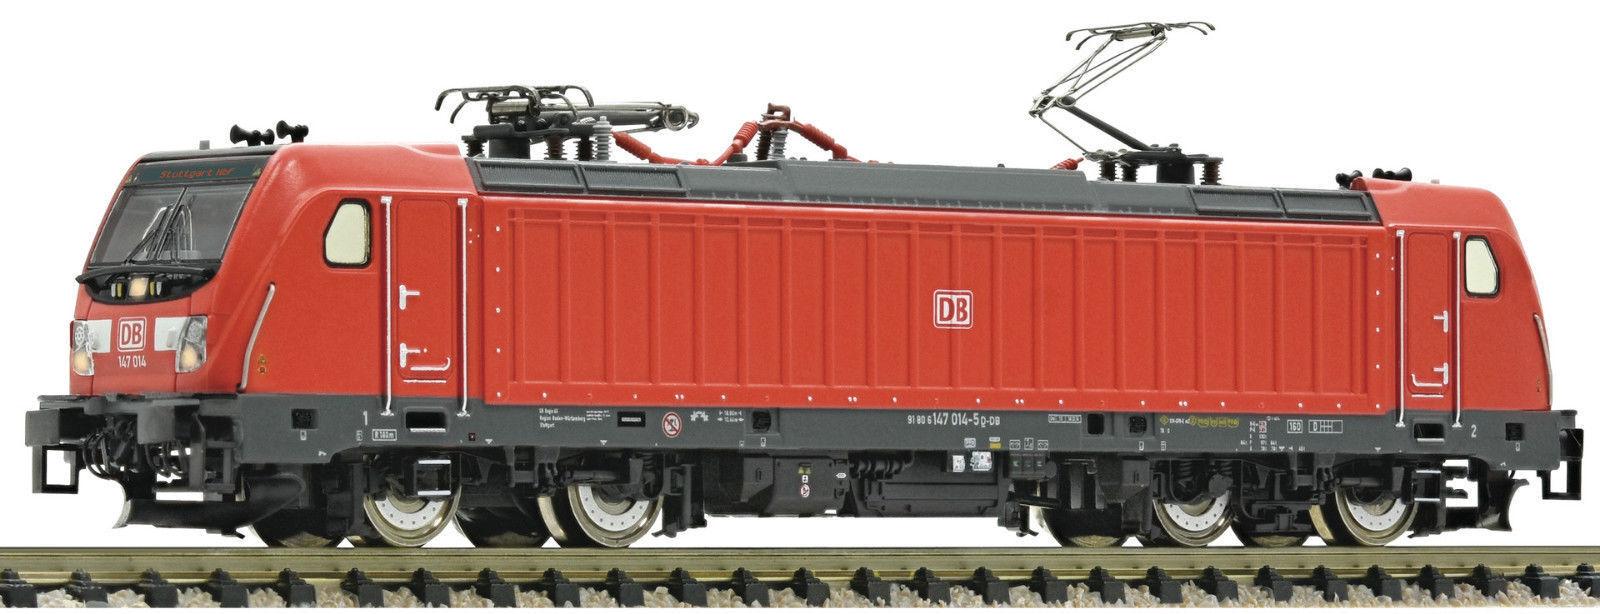 Fleischmann 739001 Locomotiva Elettrica Serie Br 147 014-5 Dbag Ep.vi Nuova